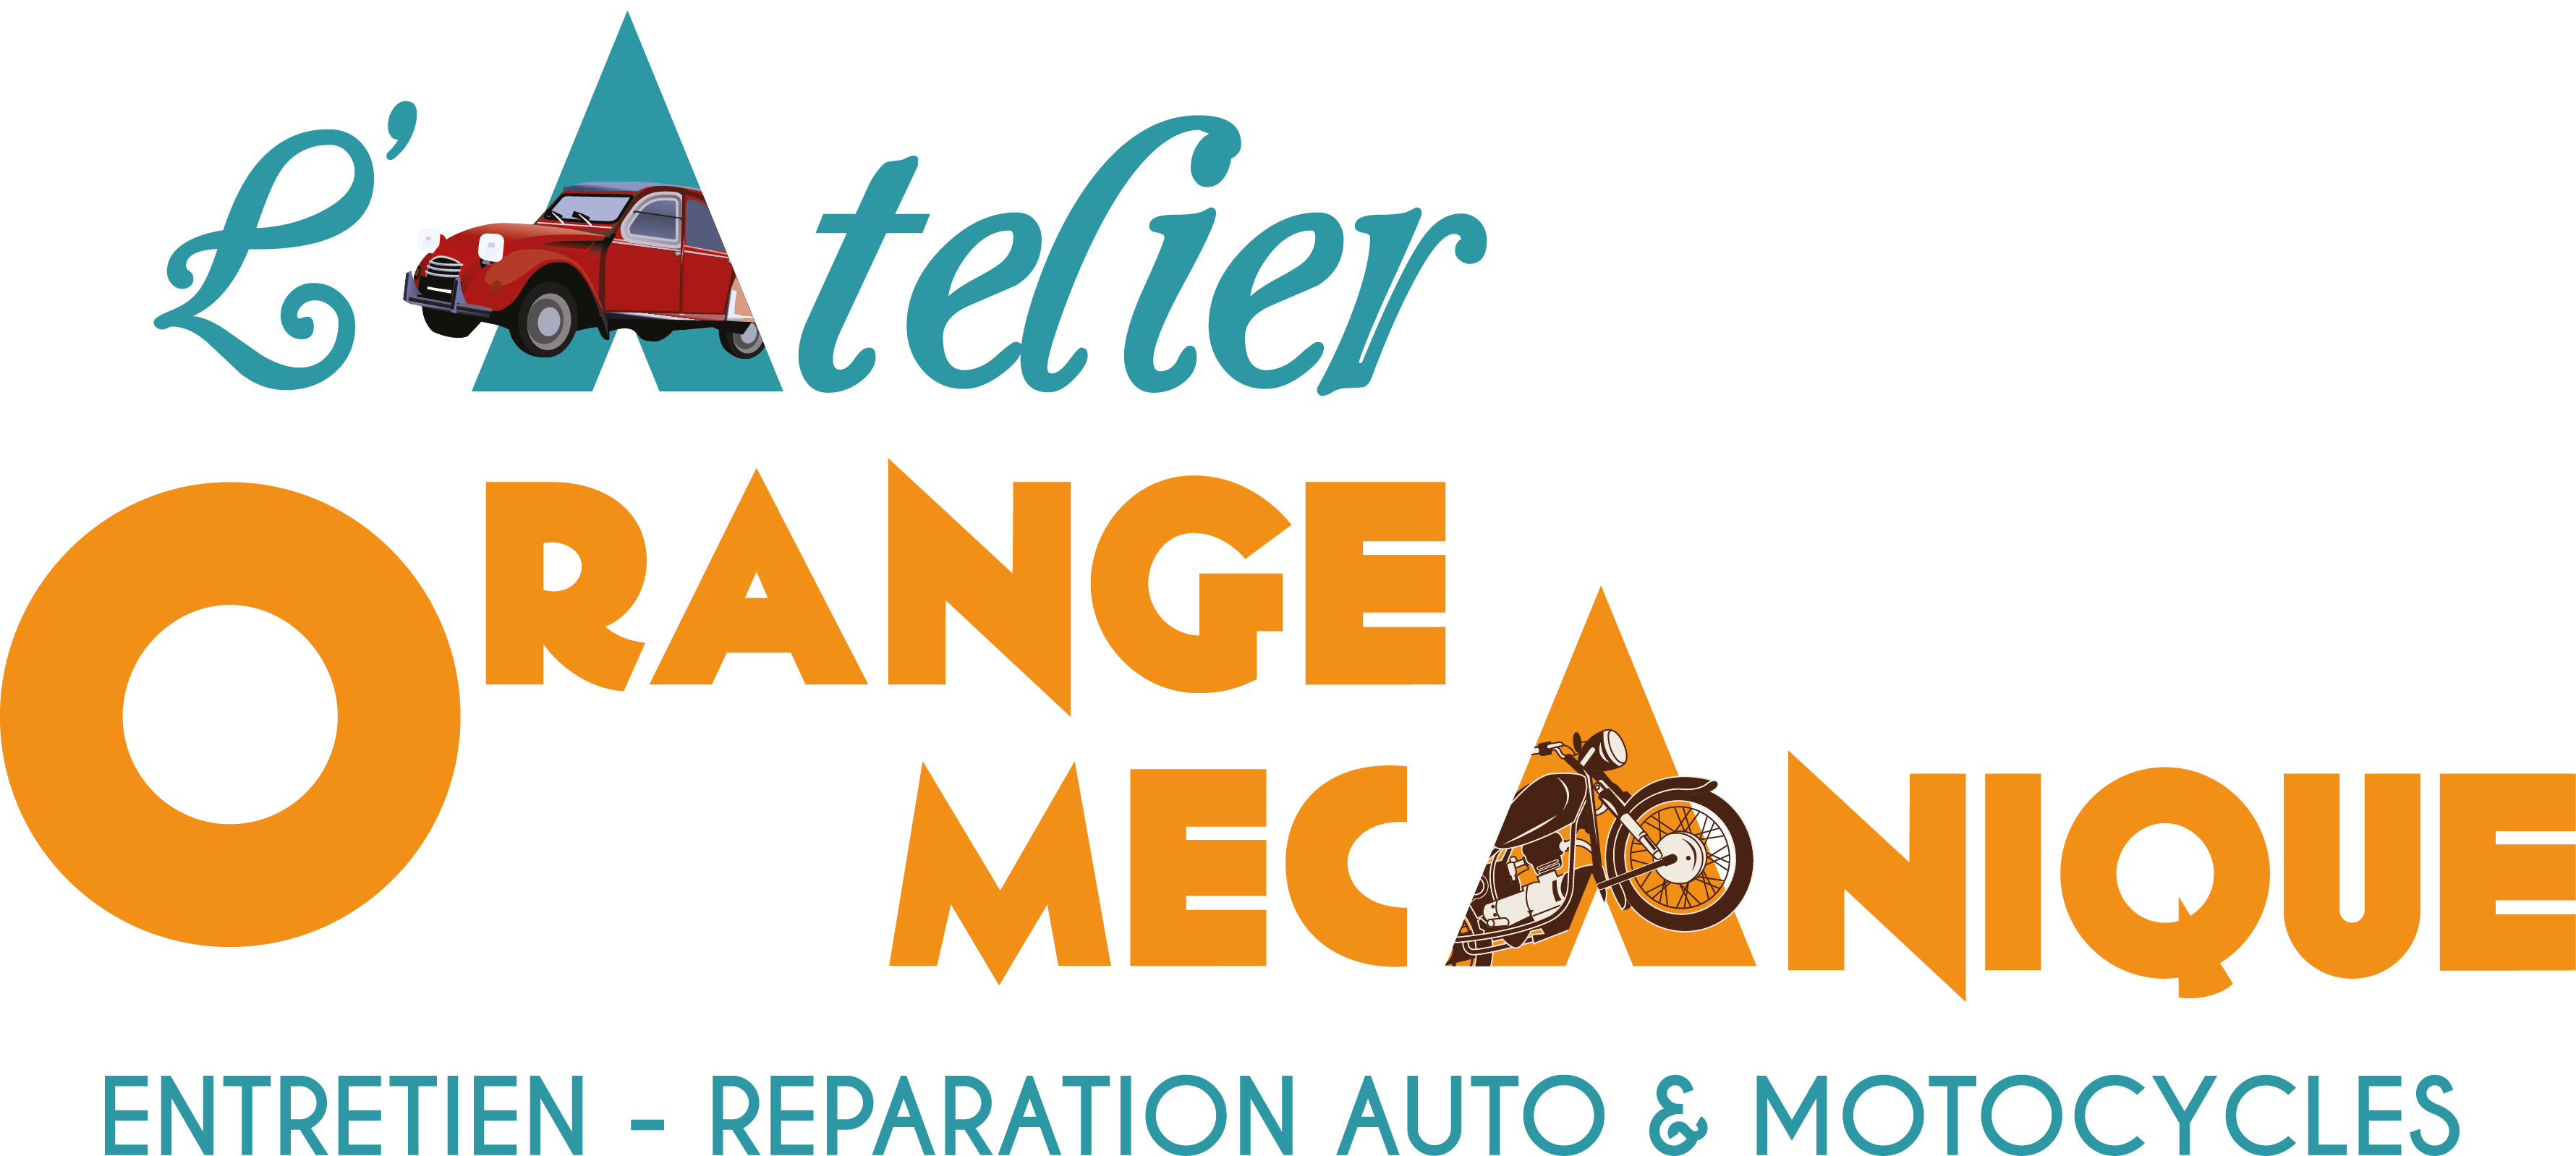 L'atelier orange mécanique Logo